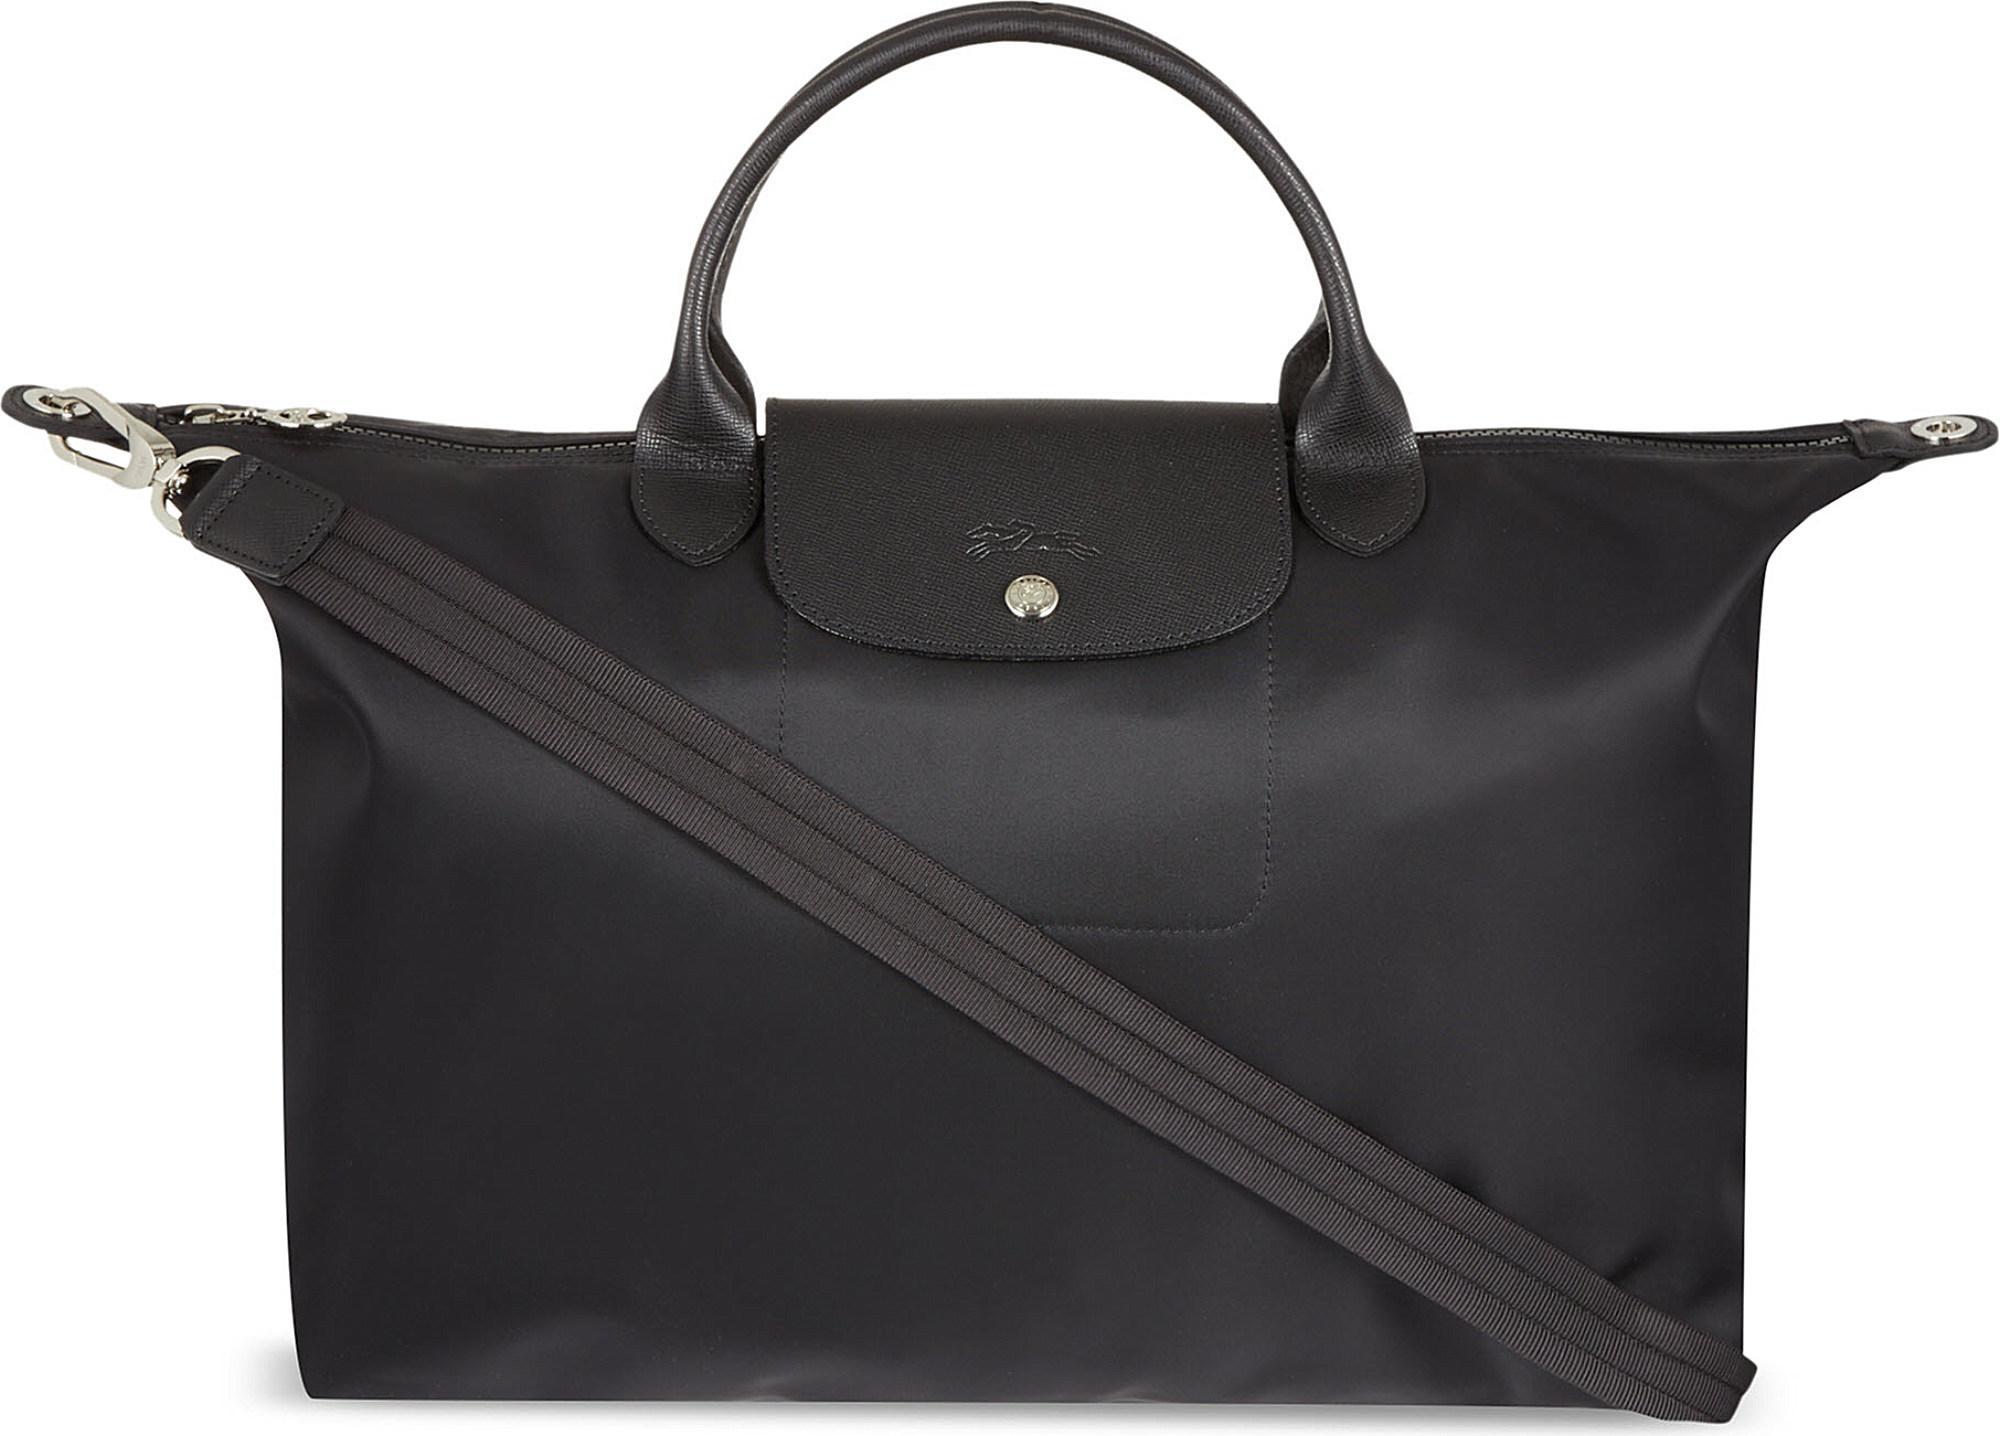 92f71f32cf45d Longchamp Le Pliage Neo Large Handbag in Black - Save 27% - Lyst